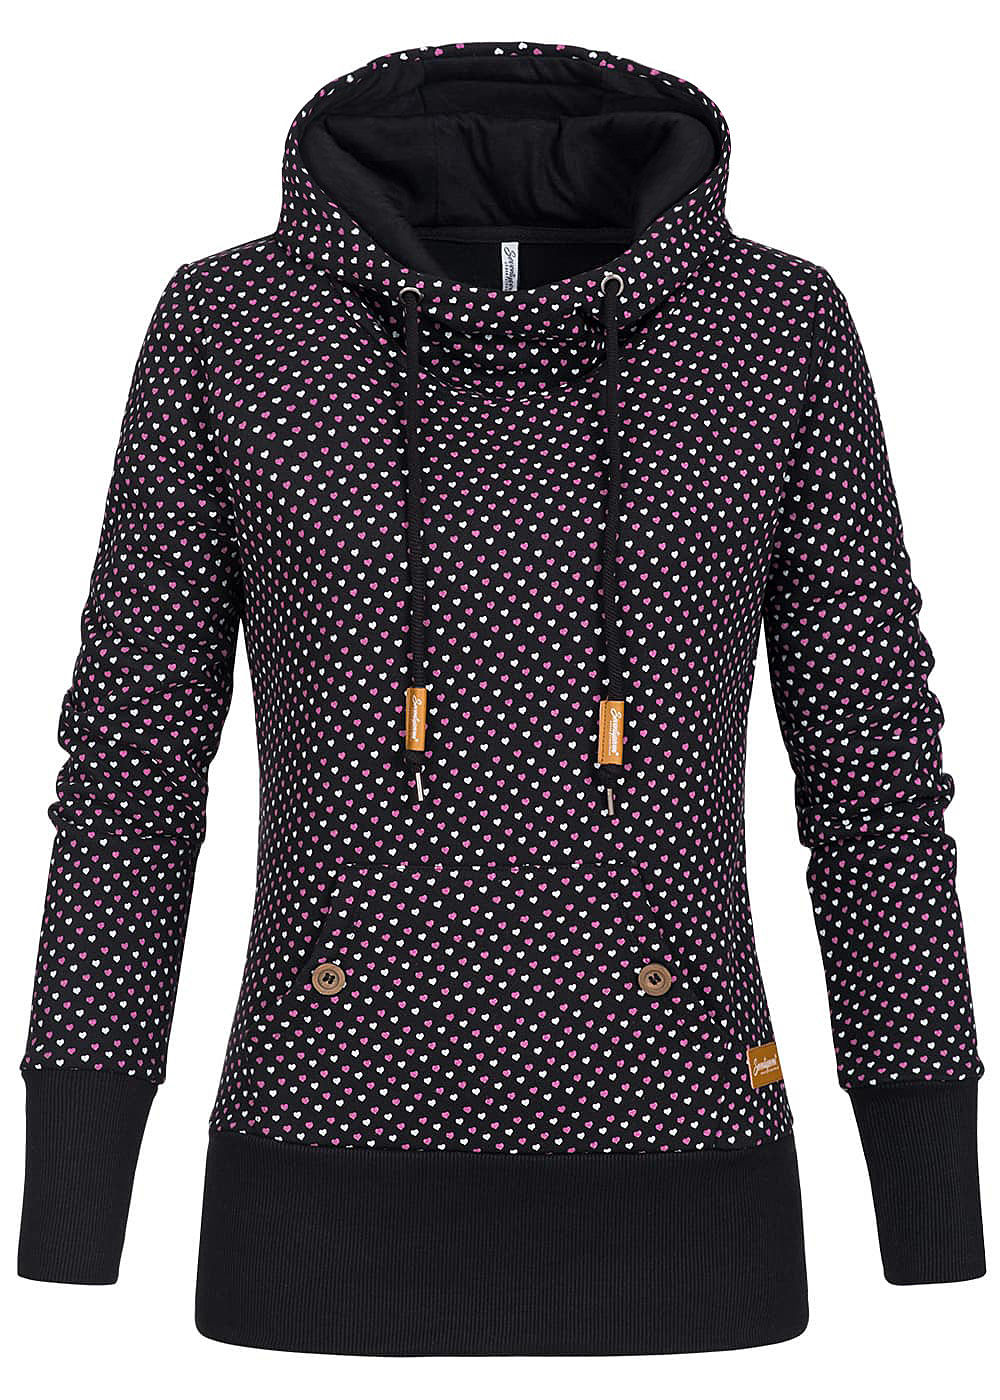 seventyseven lifestyle damen hoodie kapuze herz muster schwarz 77onlineshop. Black Bedroom Furniture Sets. Home Design Ideas